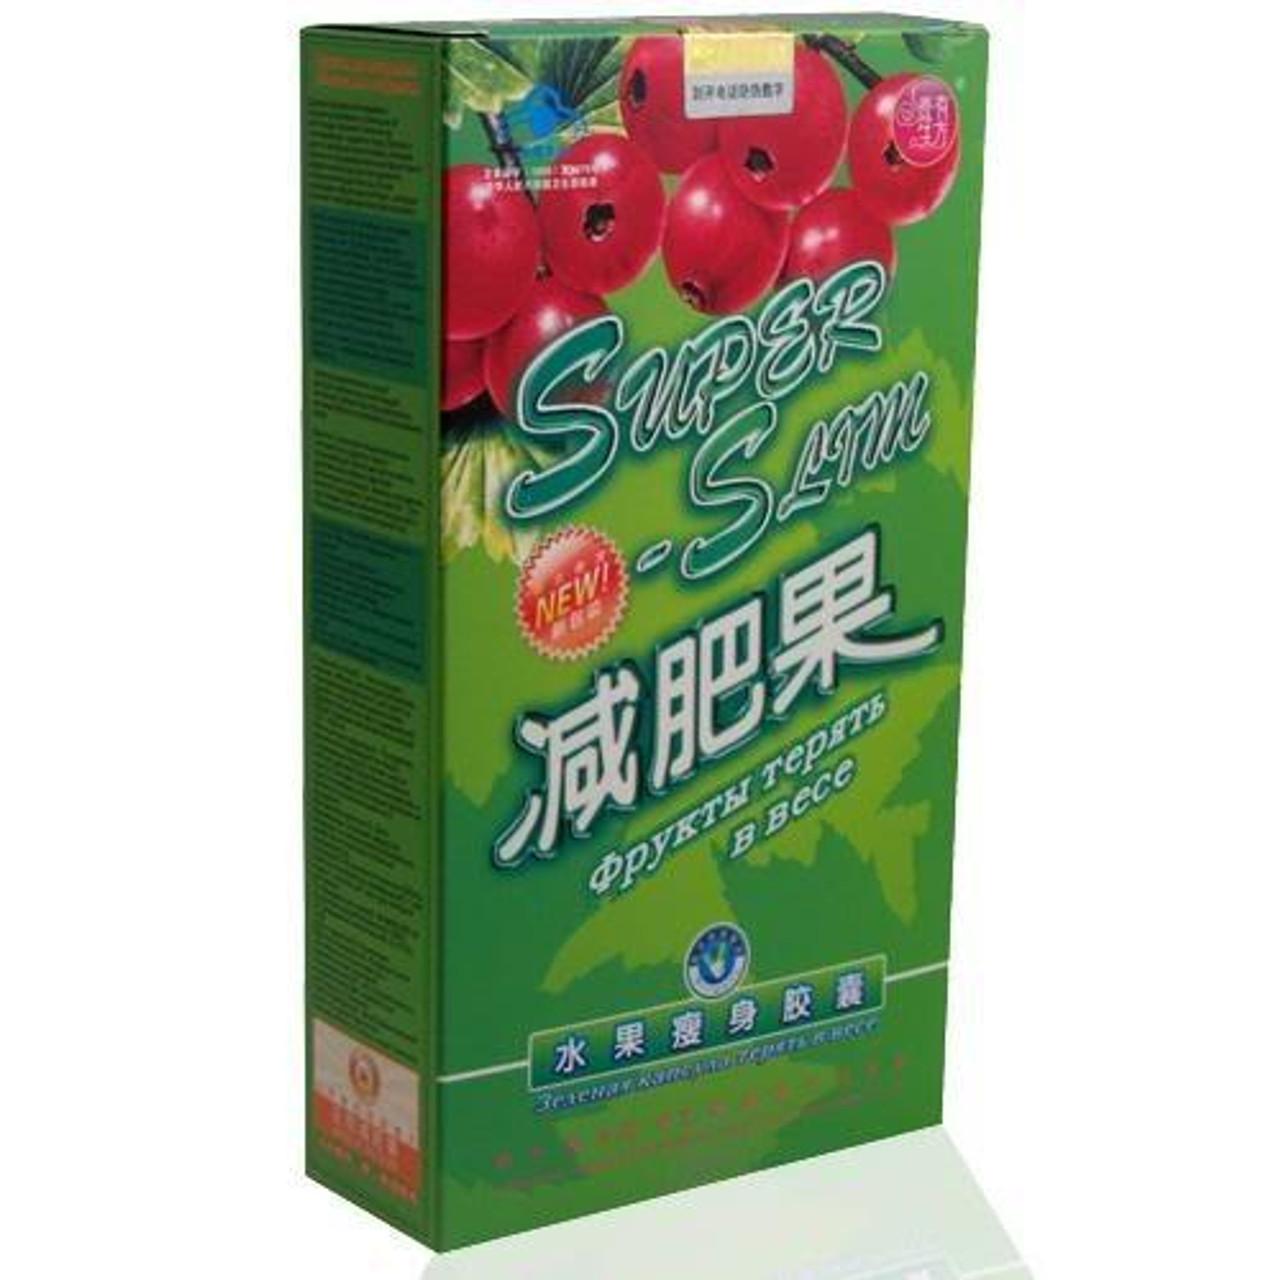 Super Pomegranate